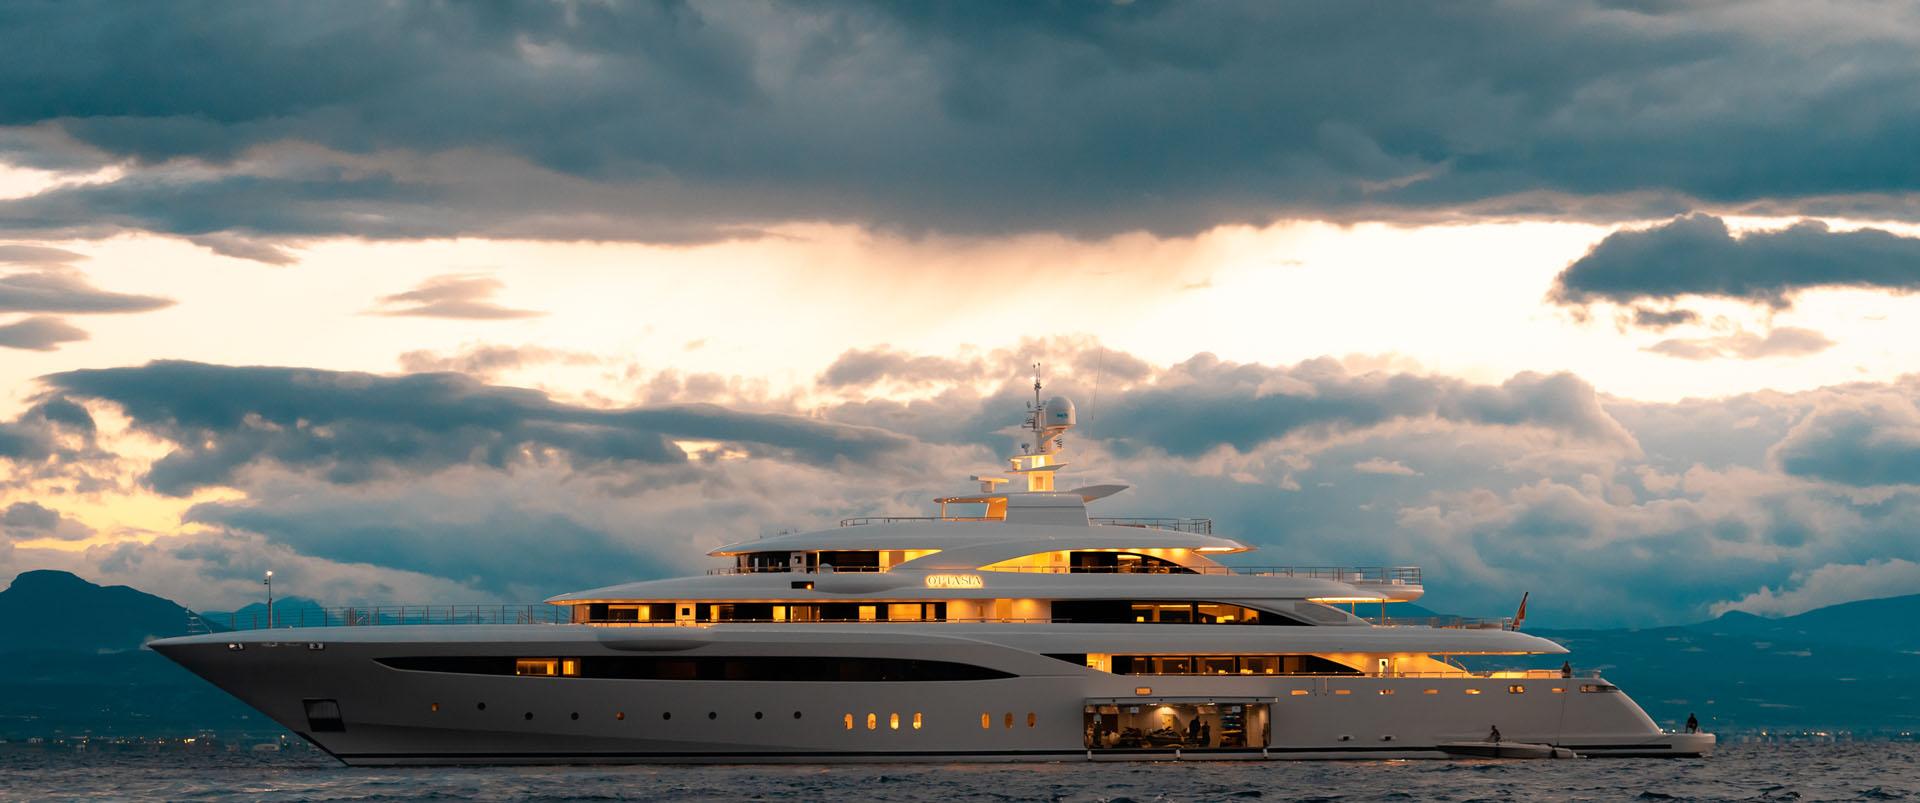 Mega Yacht O'PTASIA In The Evening